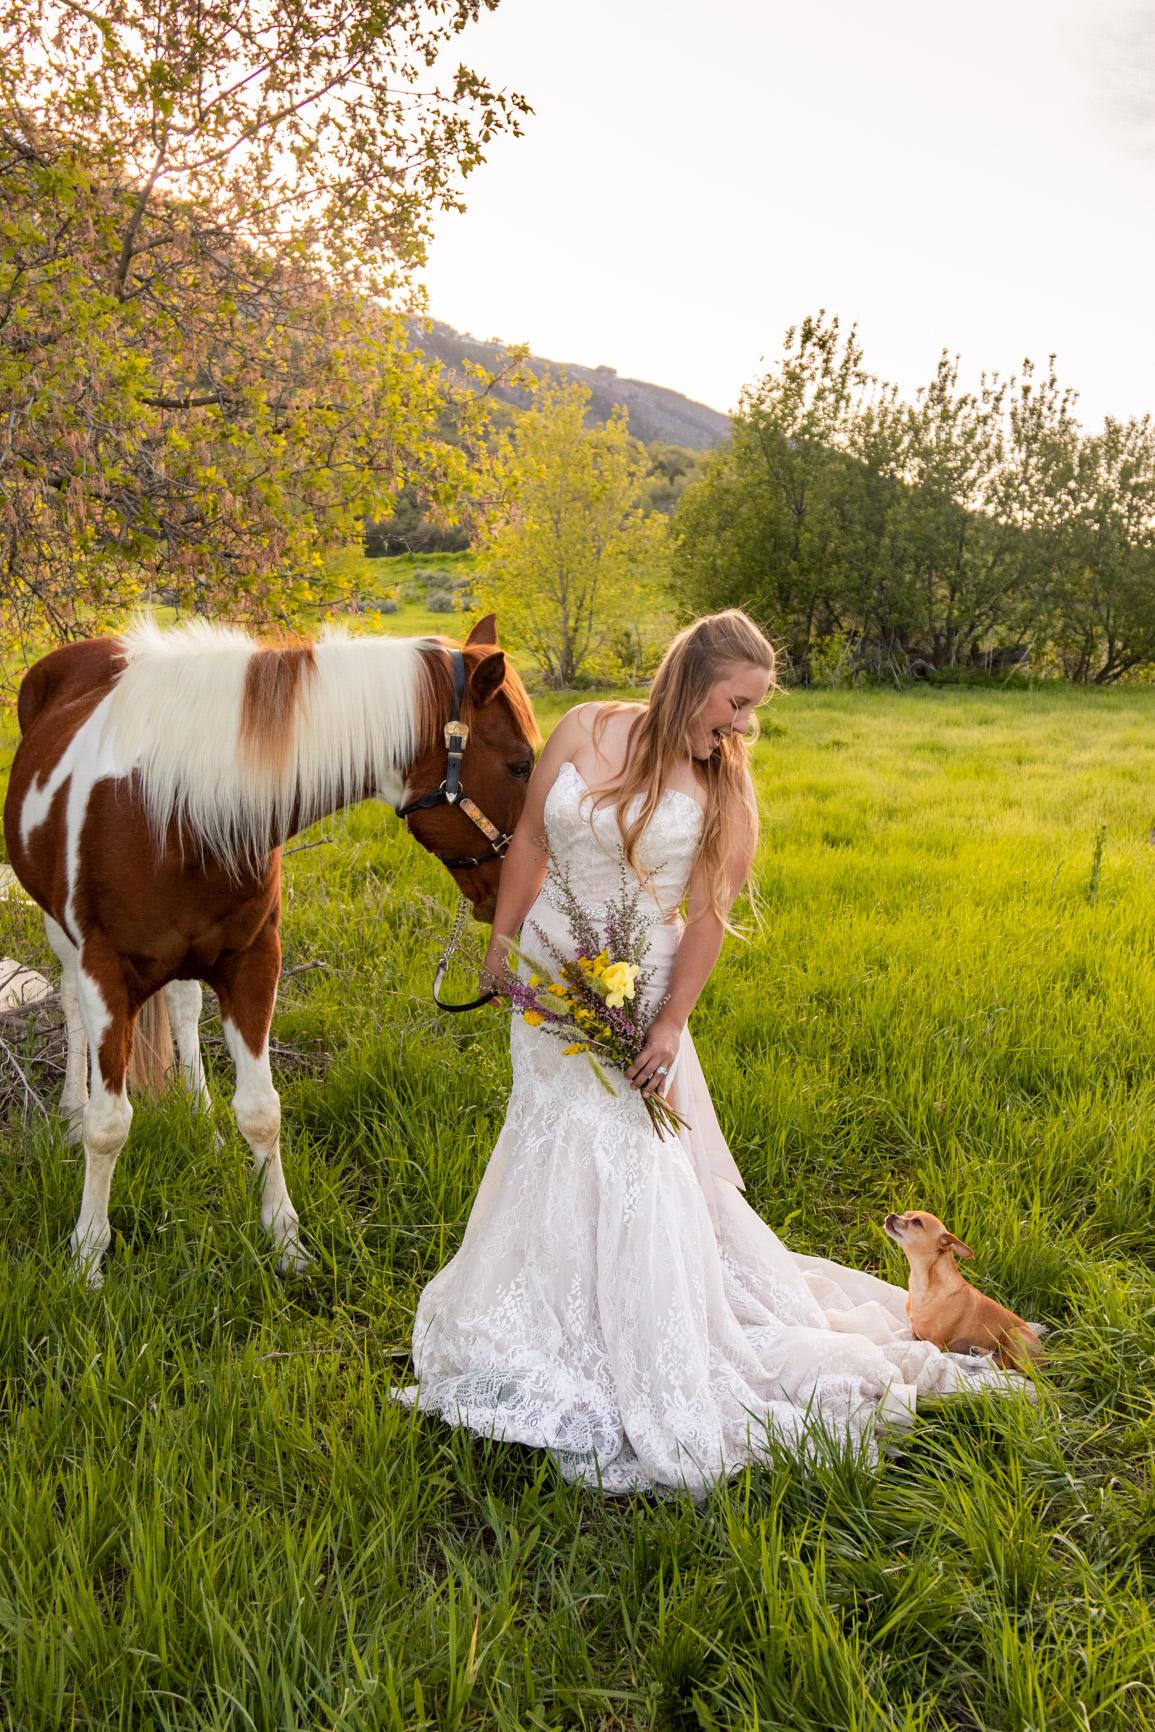 Rustic Wild Wedding Bouquet Elopement Rocky Mountains Wasatch Mountains Utah Halie West Photography 4